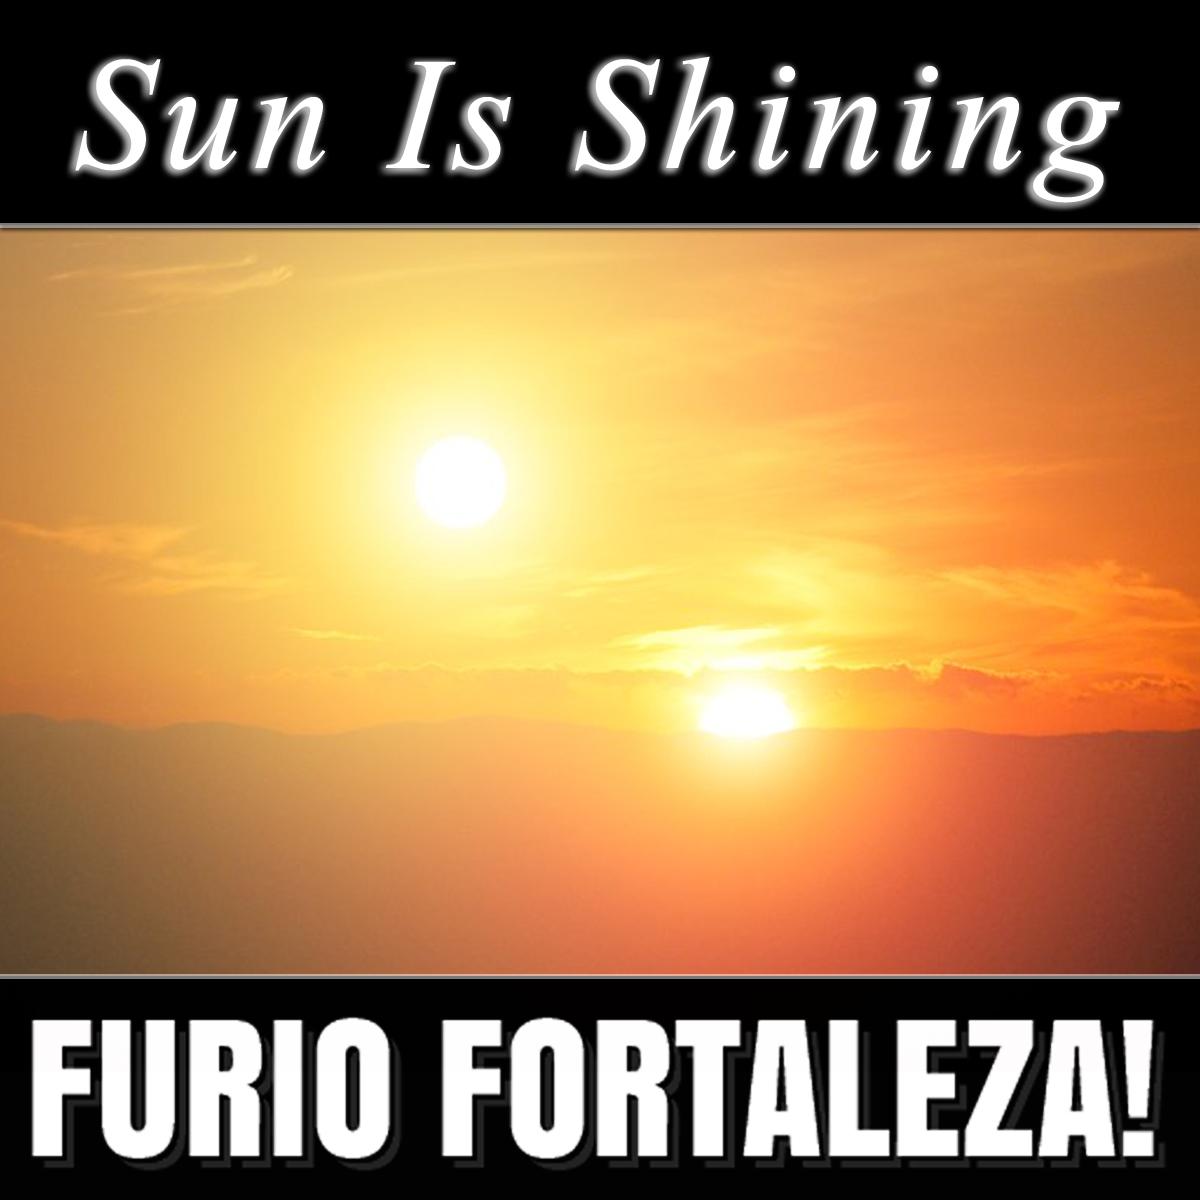 Furio Fortaleza! - 3.7 - Sun is Shining